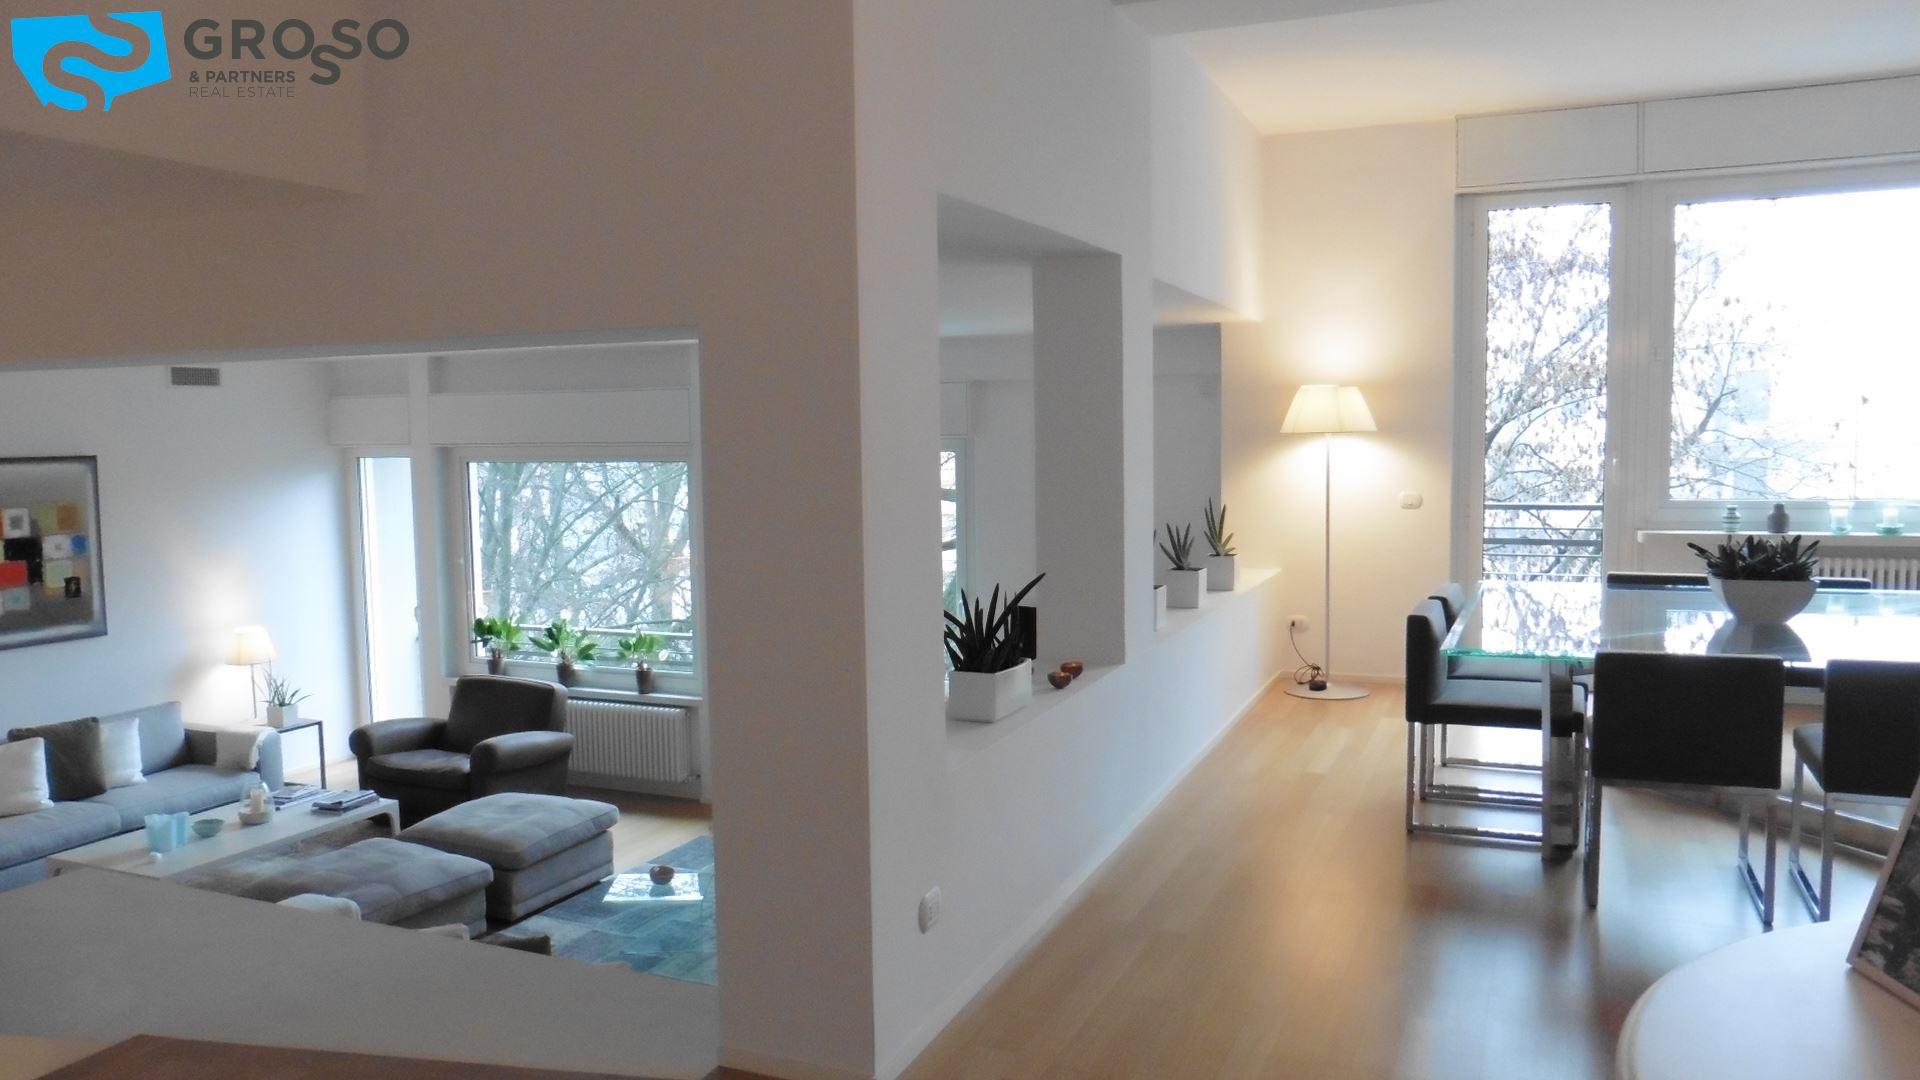 Vendita appartamento 4 camere a treviso grosso partners immobiliare - Vendita piastrelle treviso ...